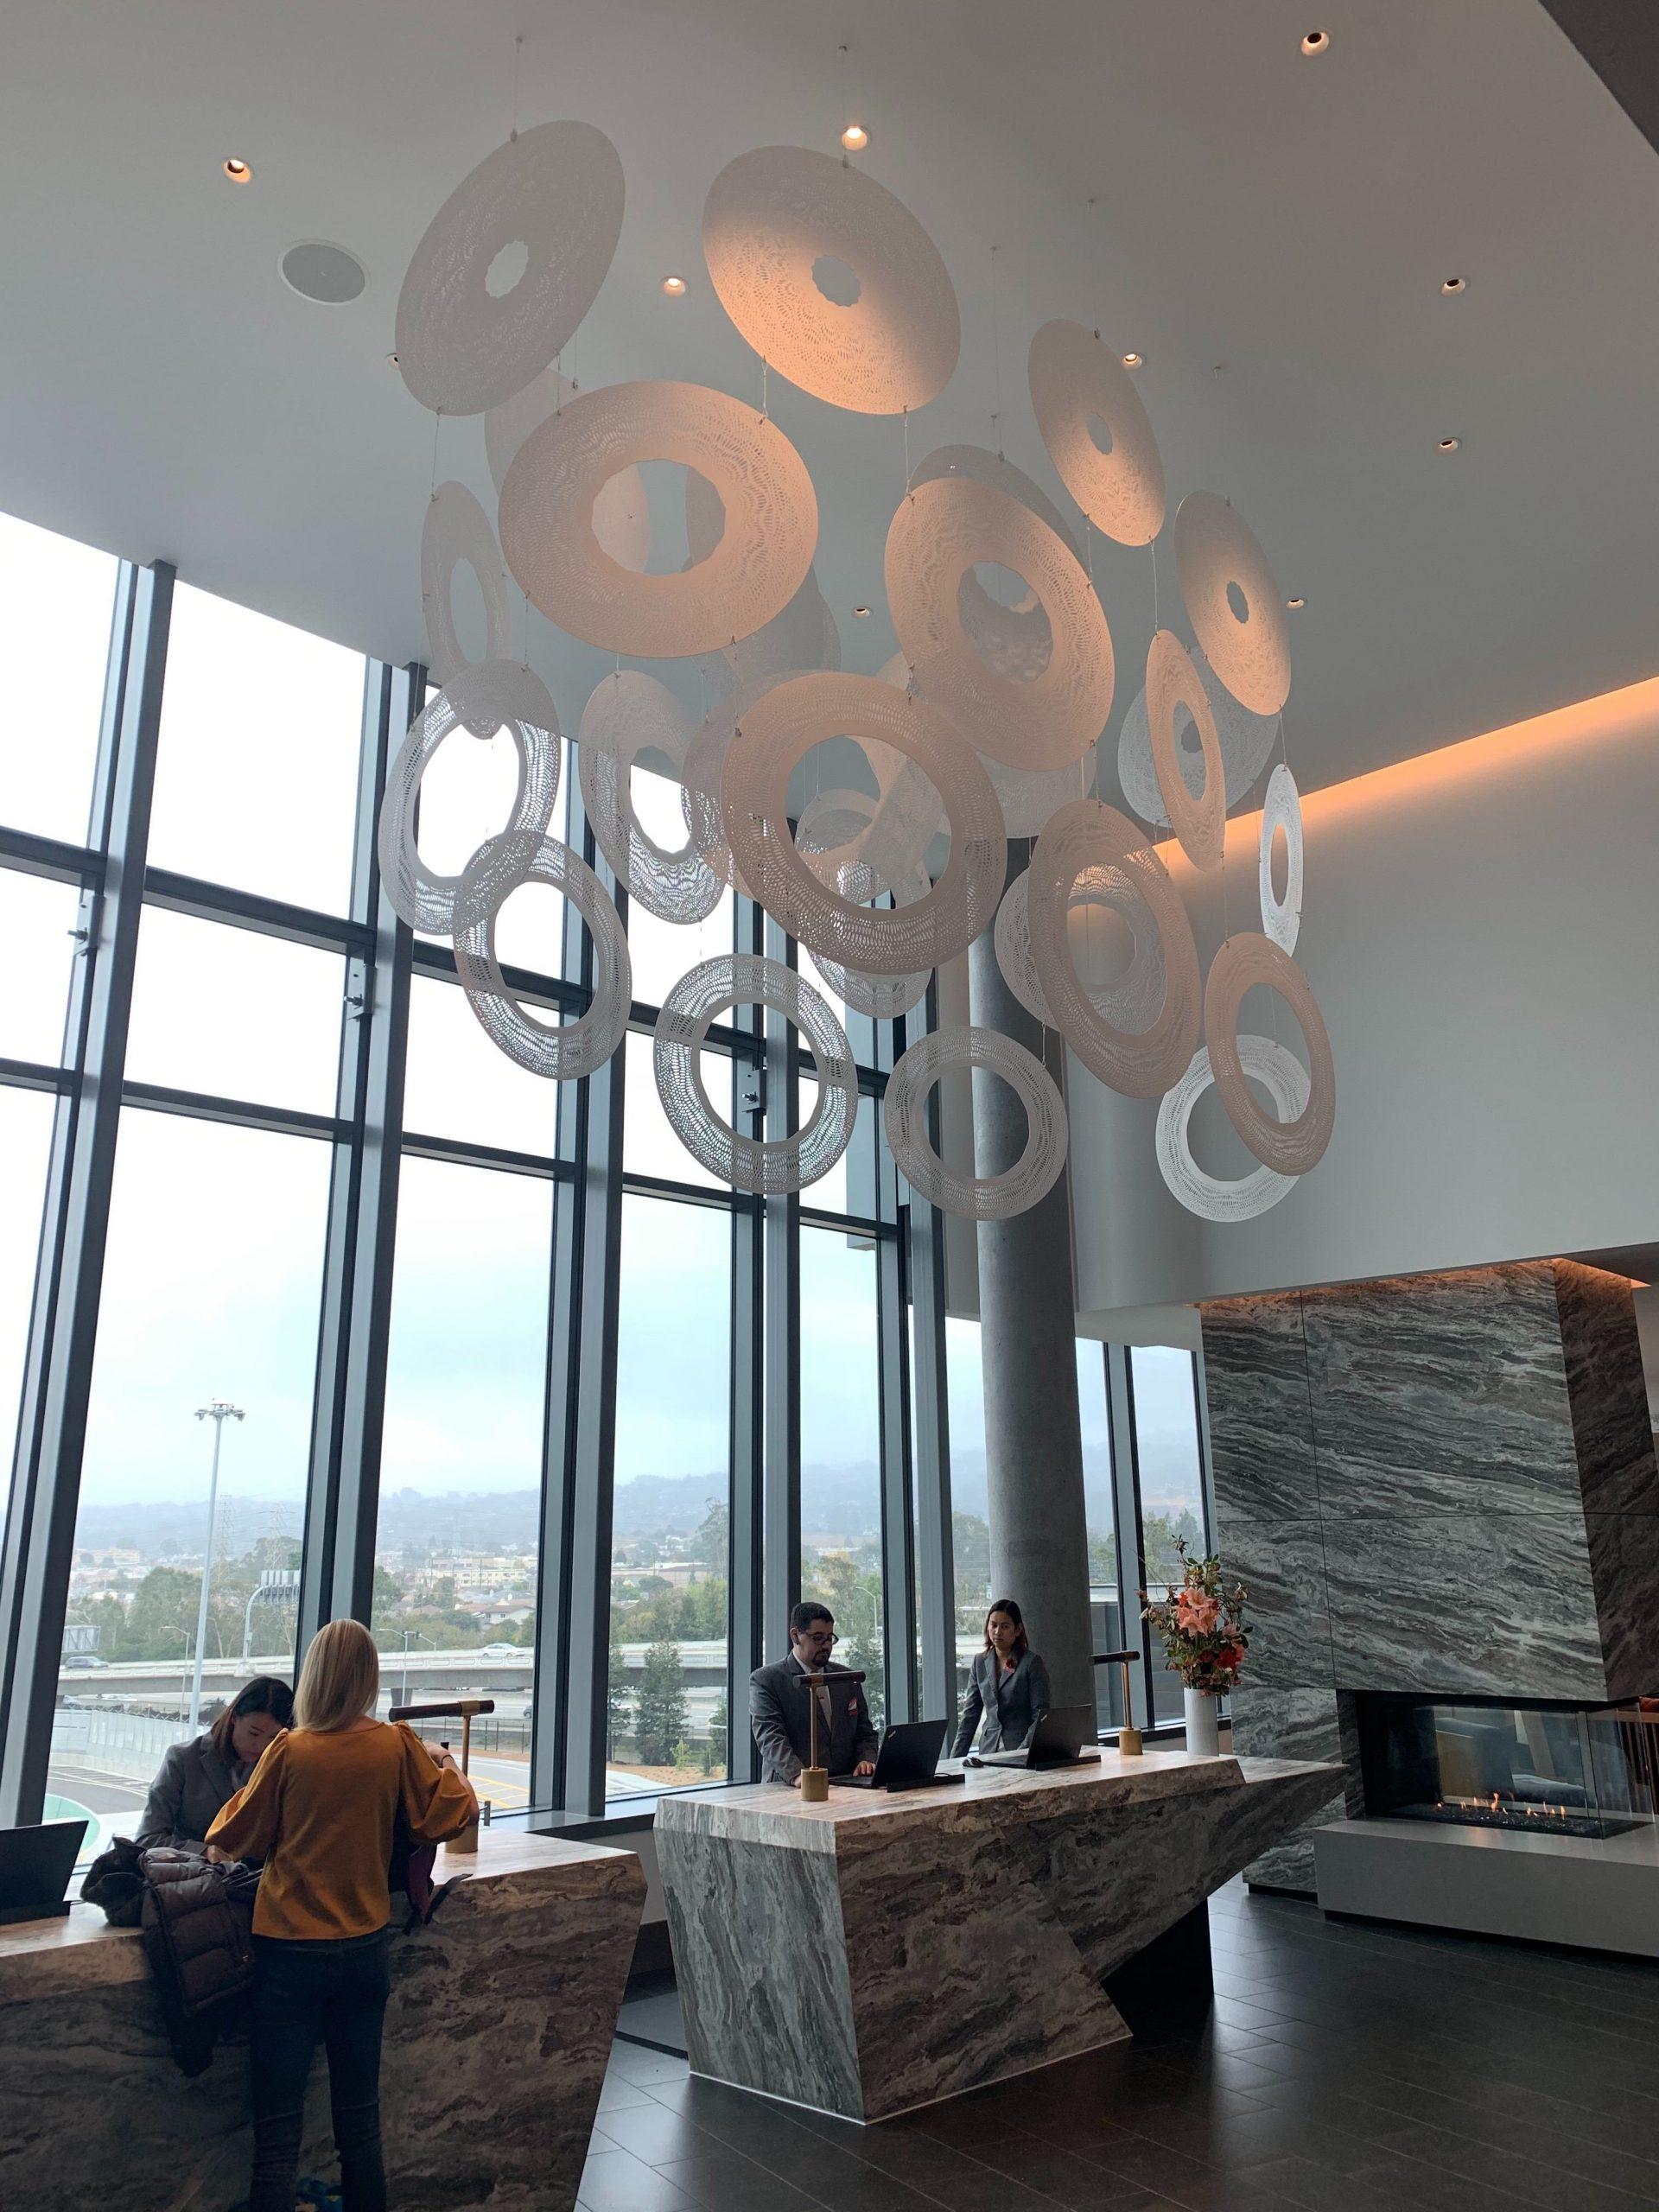 Tahiti Pehrson, San Francisco Arts Commission